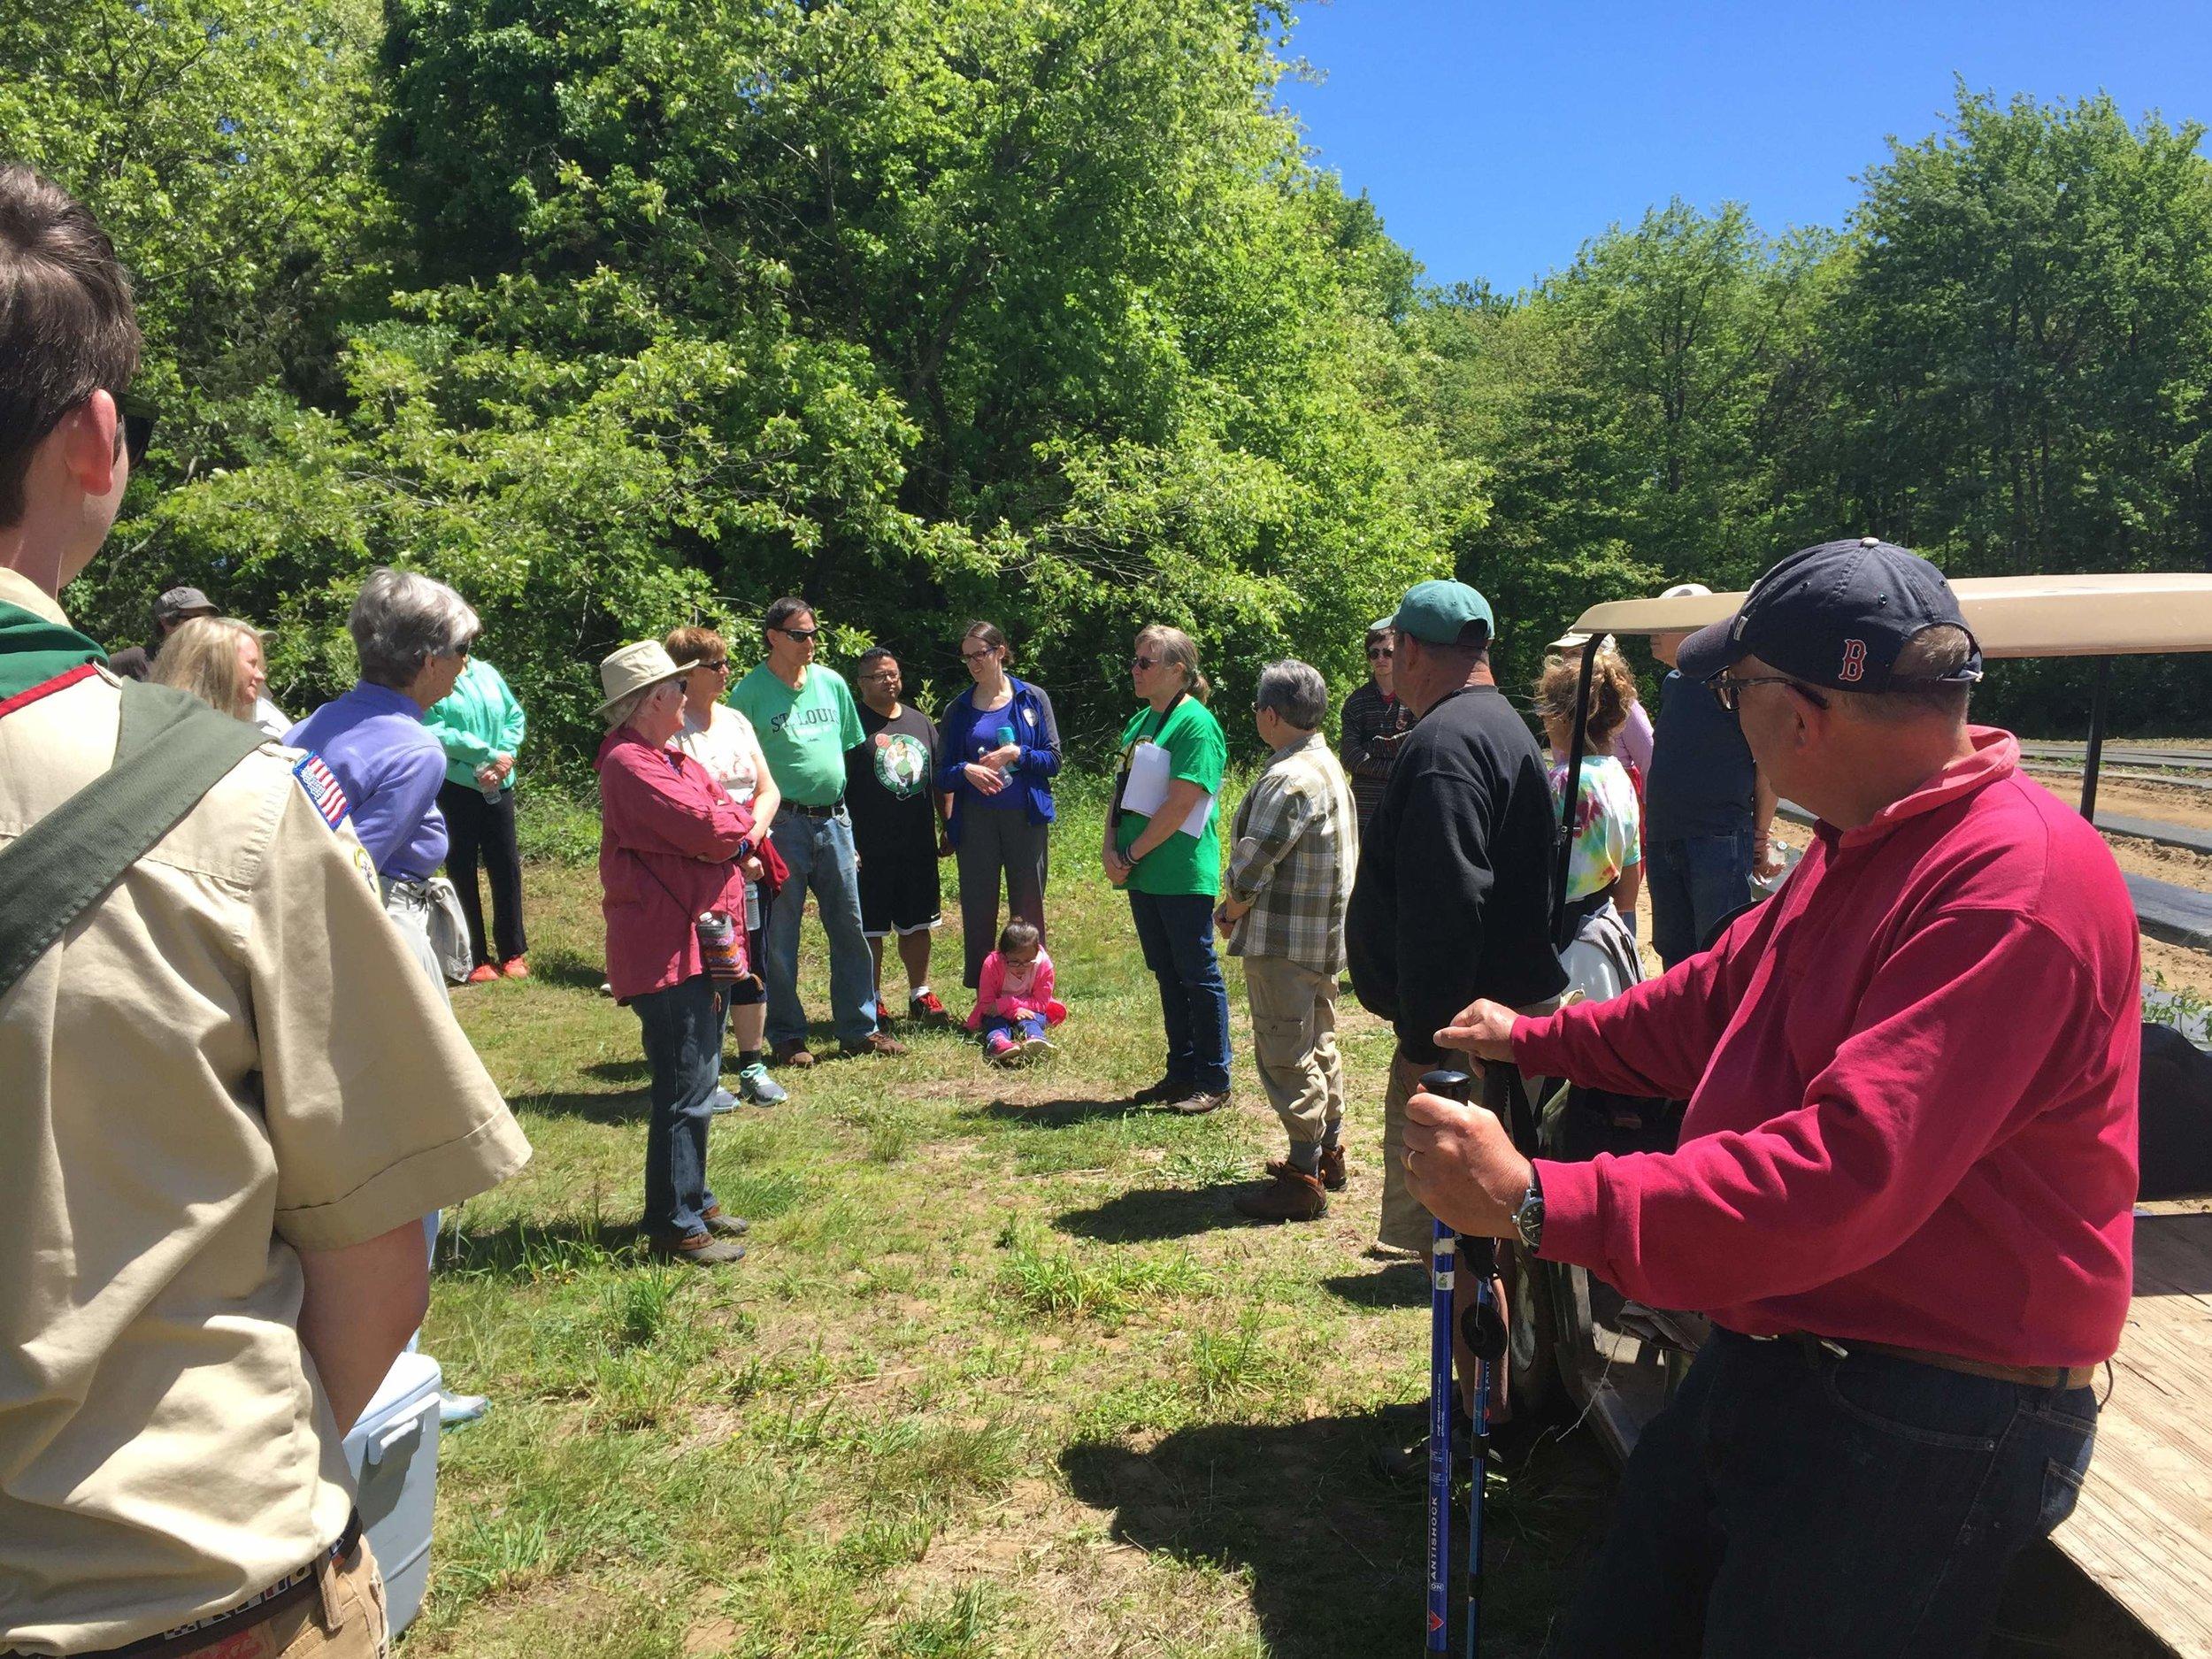 IMG_1058, National Trails Day, Lisa Presents, 06-03-17.JPG